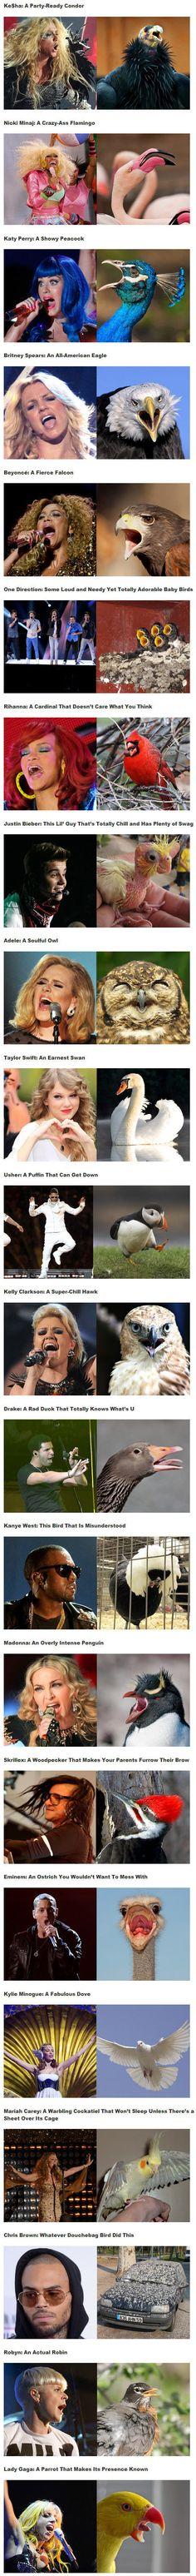 If Music Stars Were Birds… #lol #haha #funny